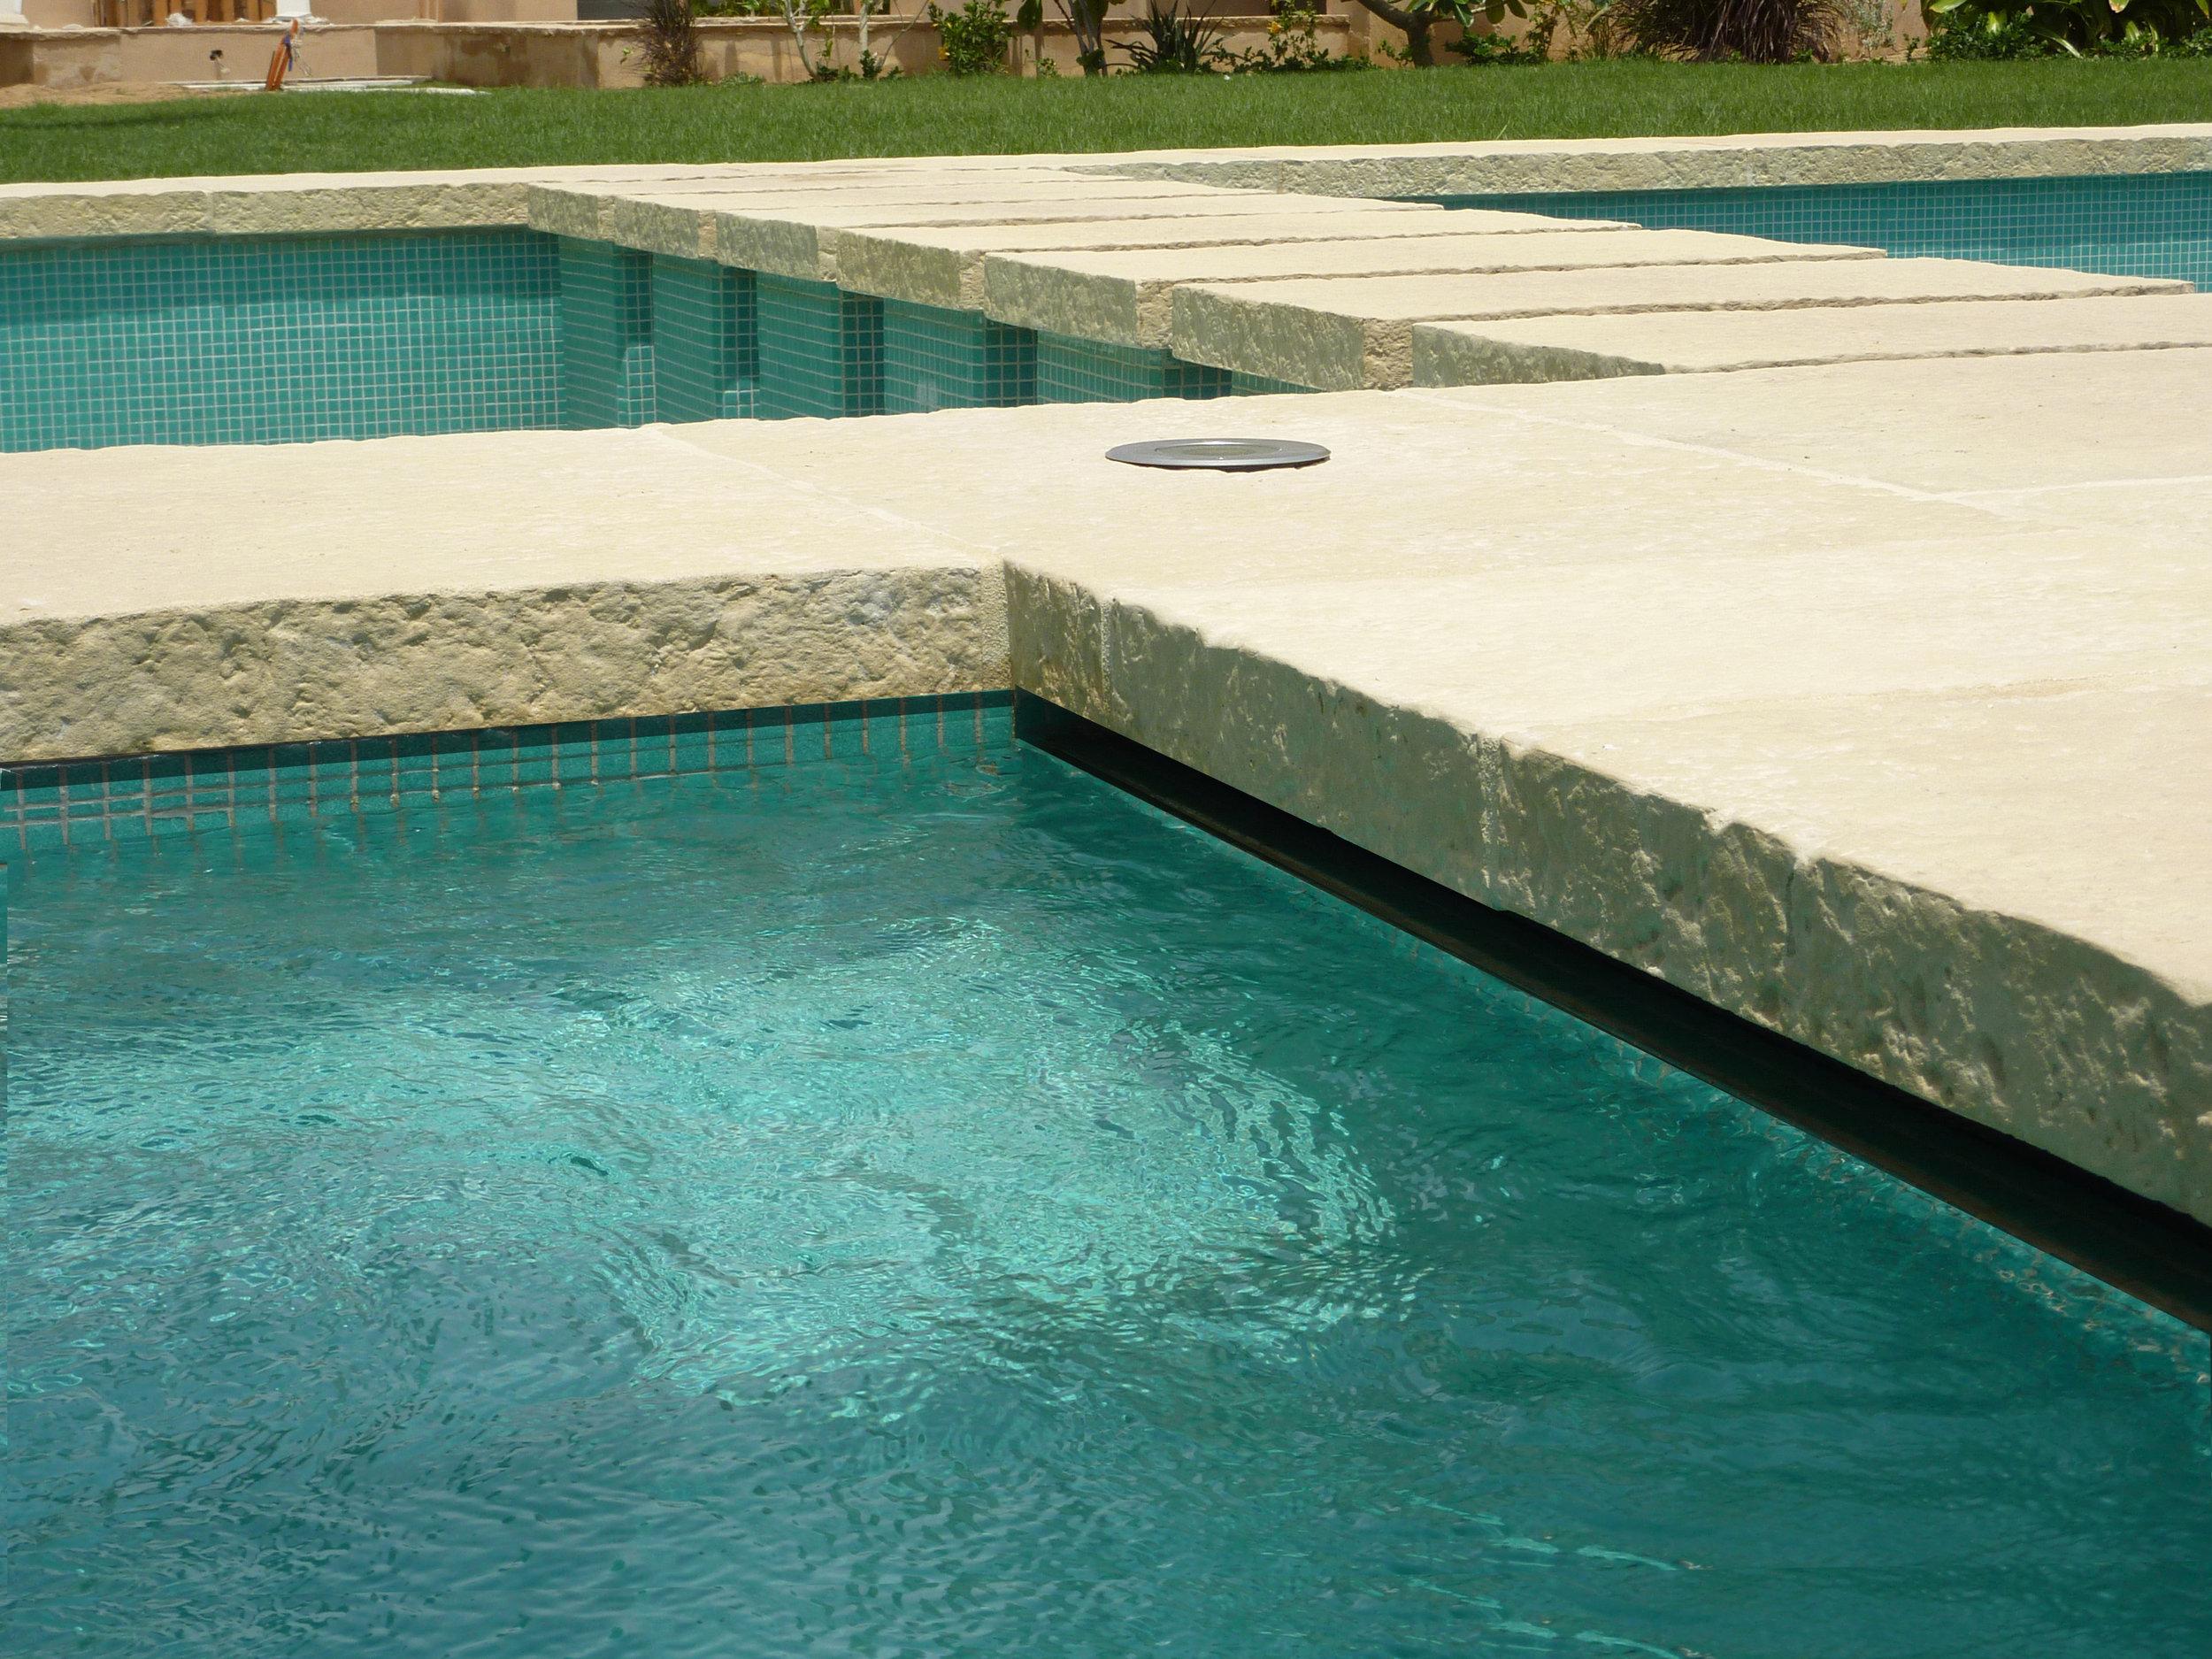 ....Pool Coping & Surrounds..ΠισΙνες & επιχεΙλια.... -